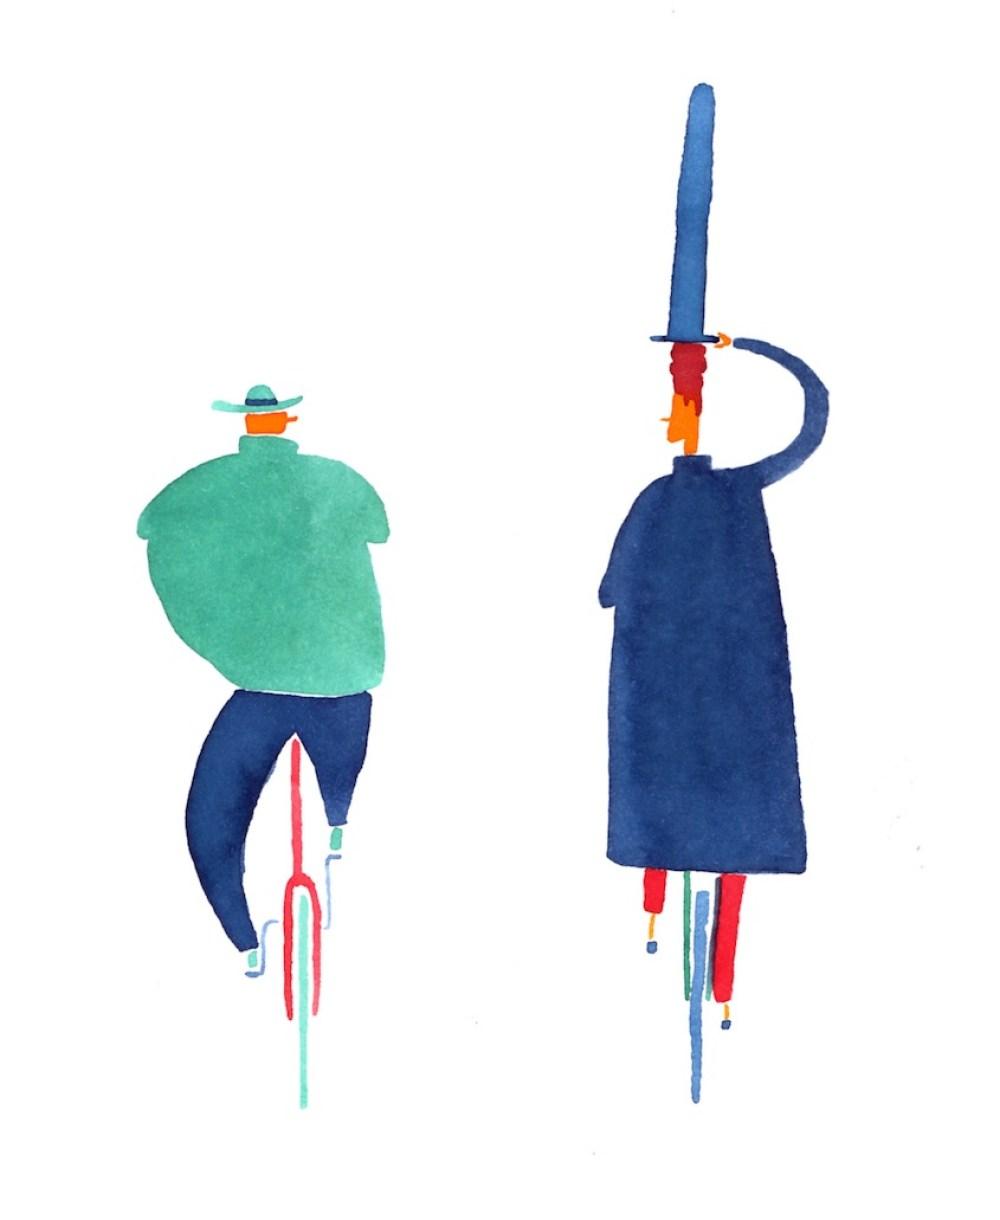 daniel-frost-illustrations_urbancycling_4